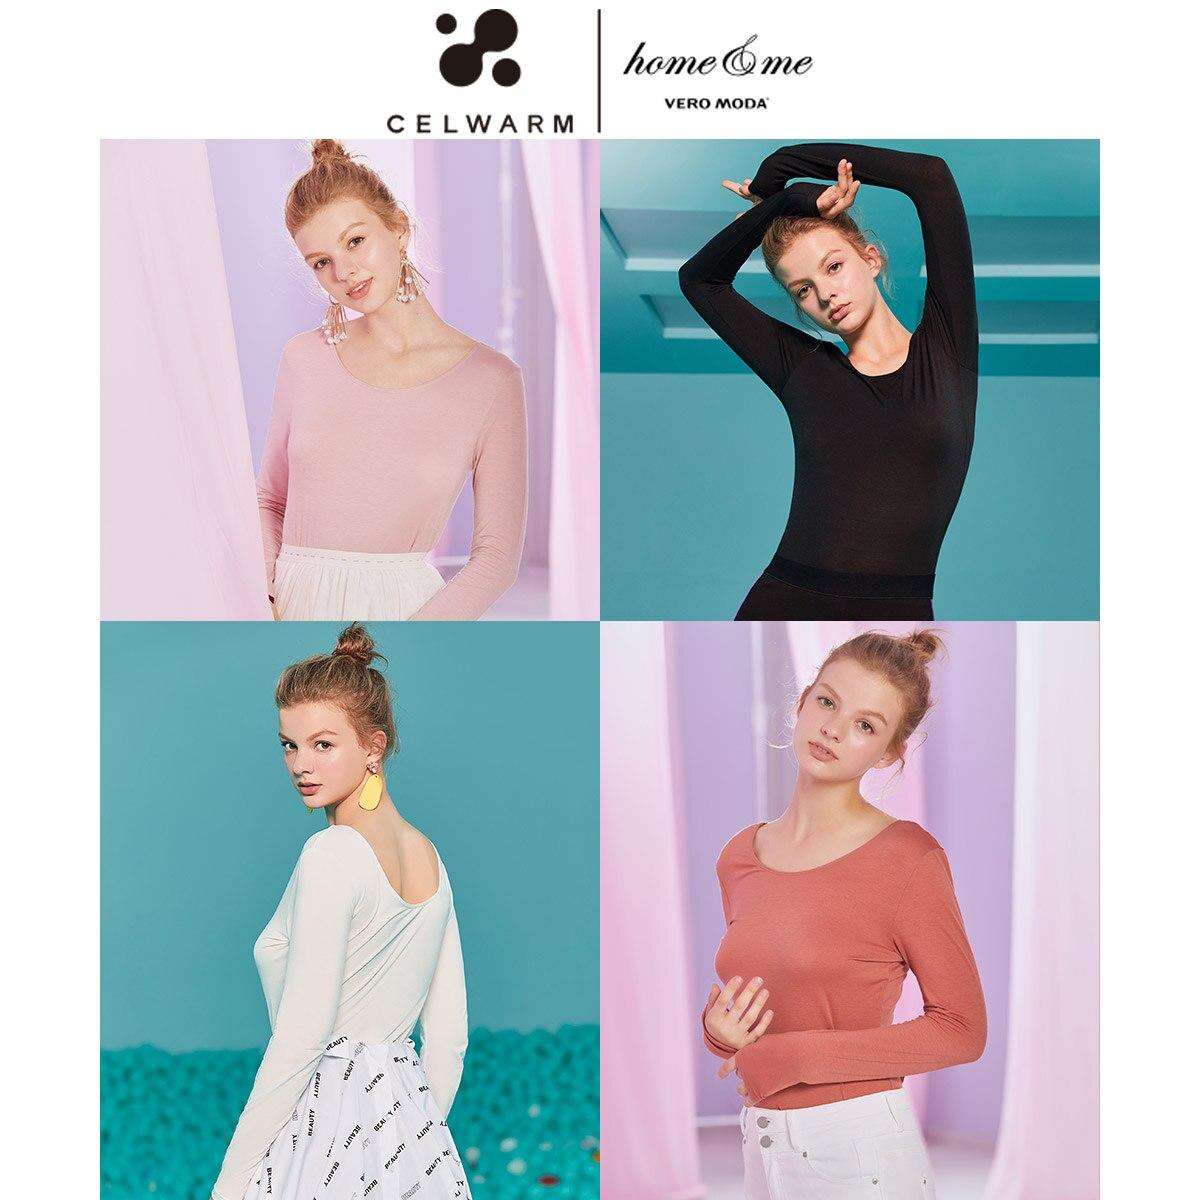 Vero Moda Women's Thermal Base Close-Fitting Underwear Tops | 319402503